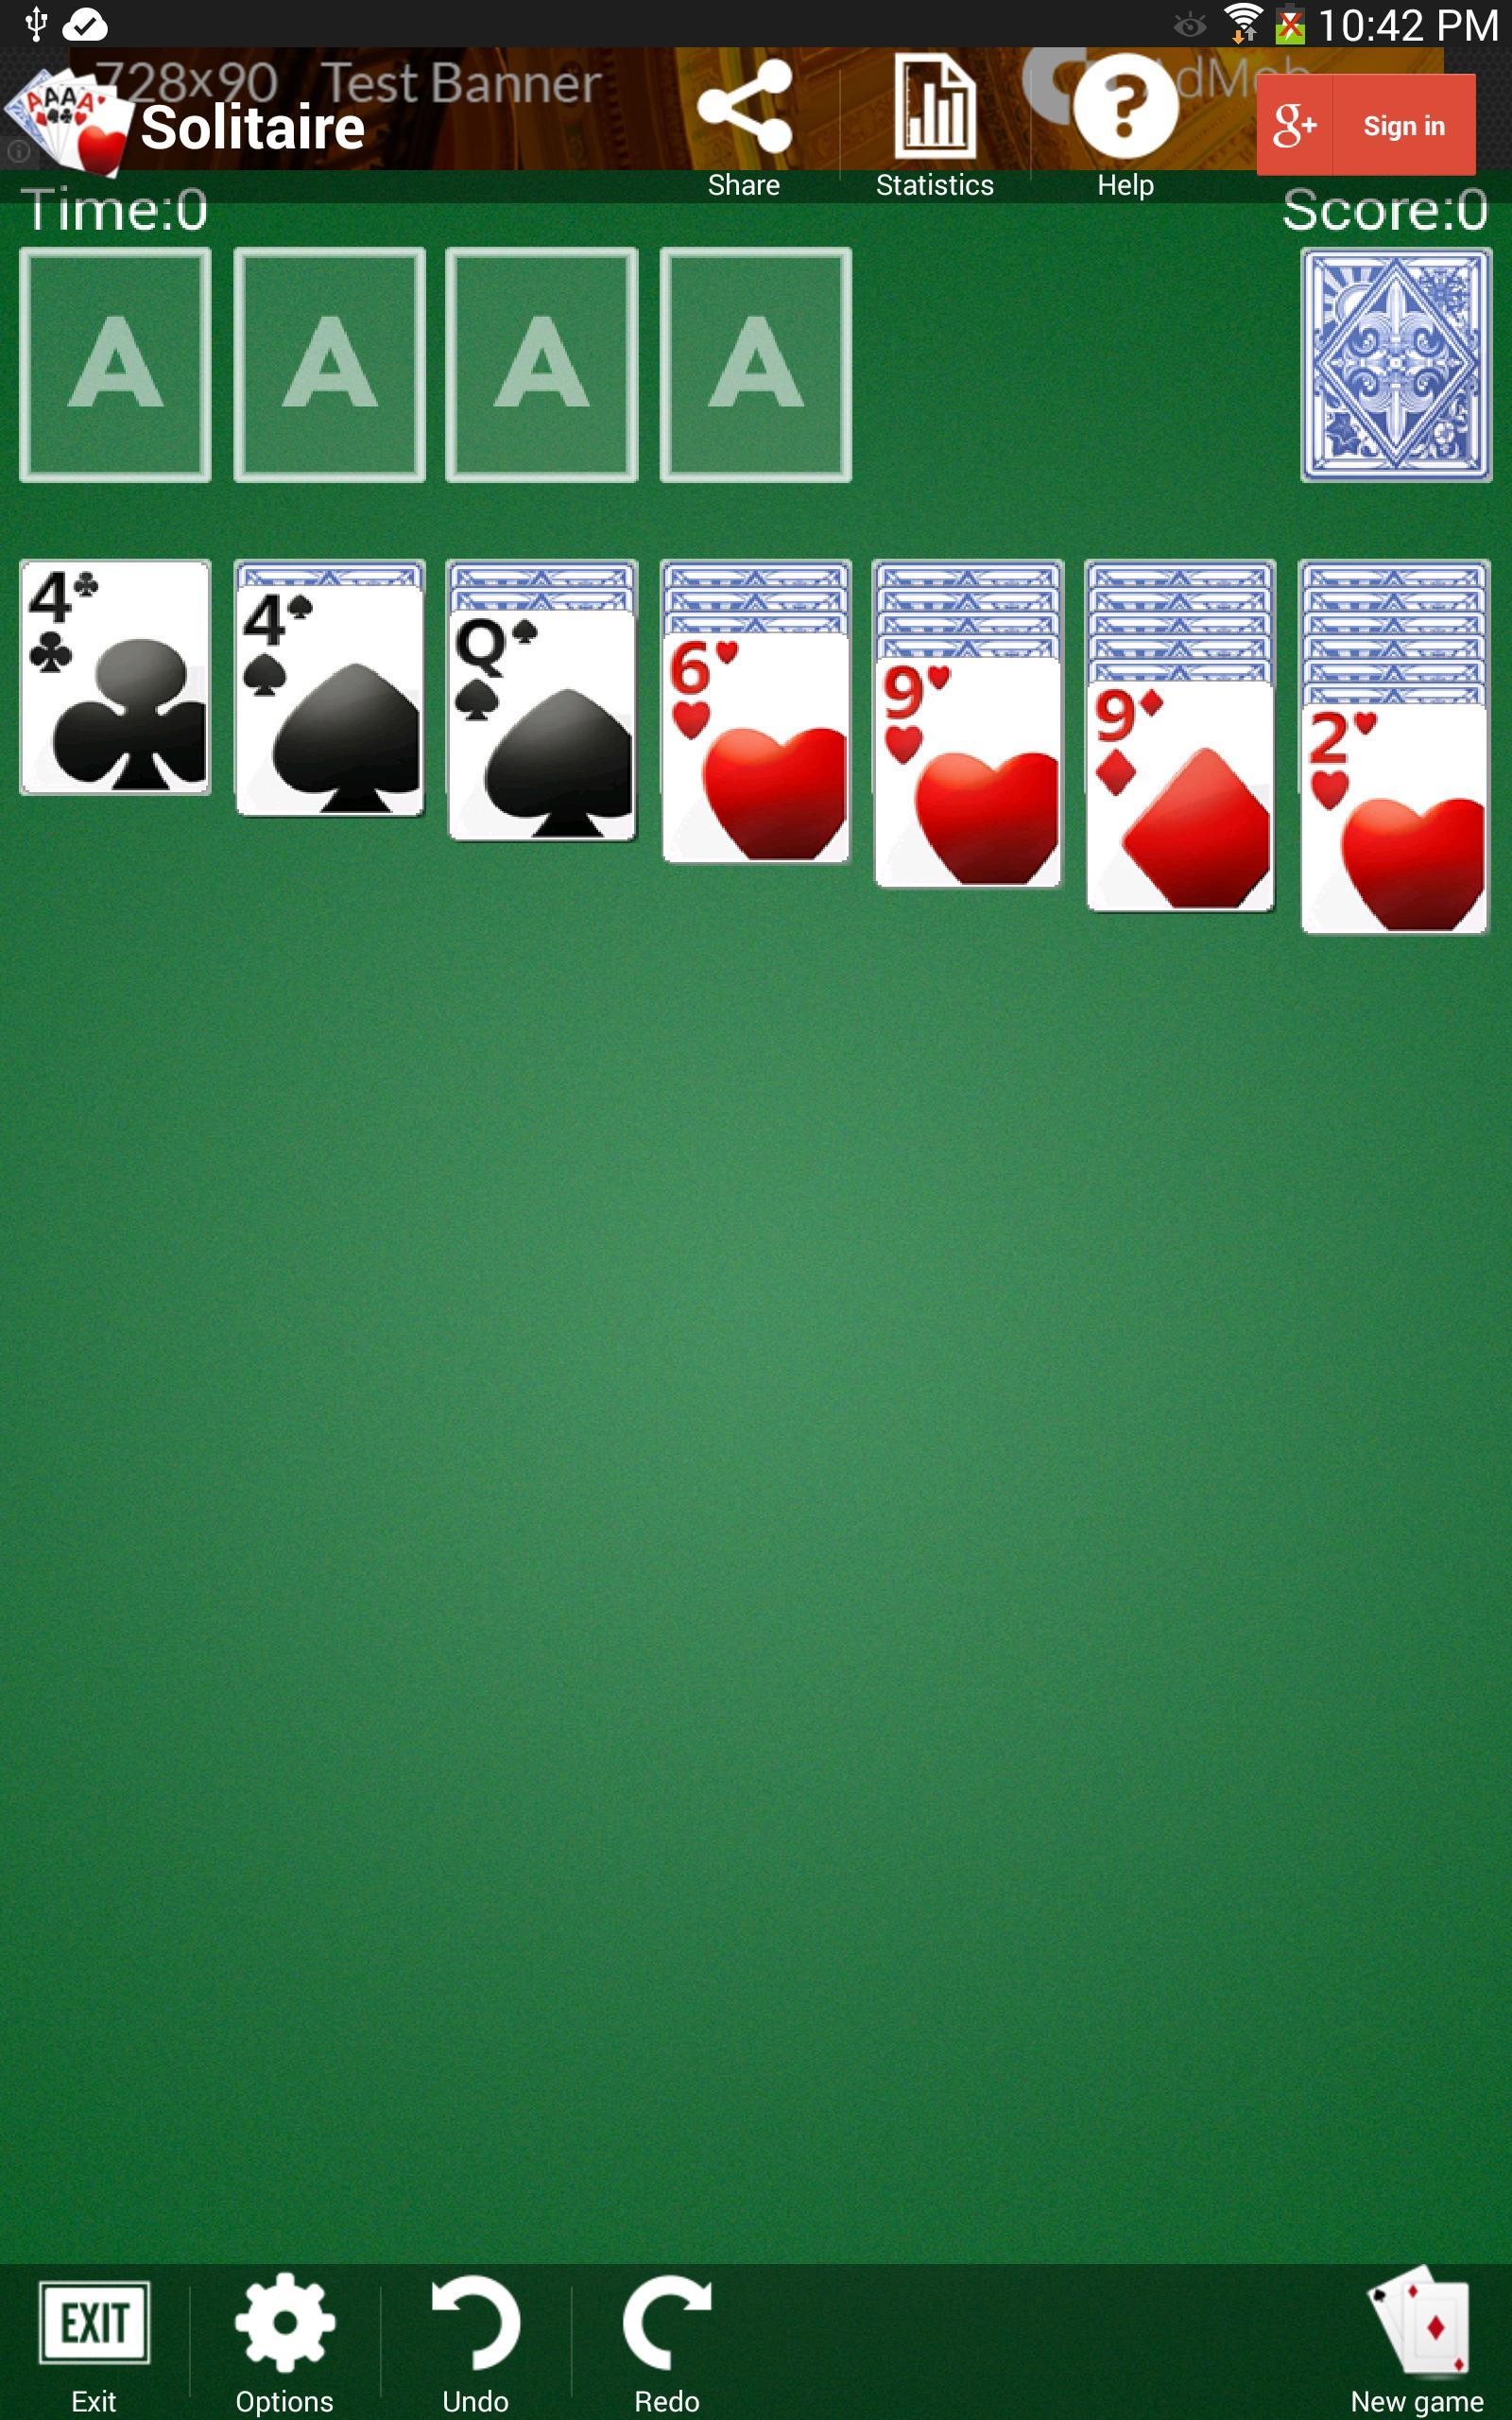 Solitaire 1.3.5 Screenshot 12